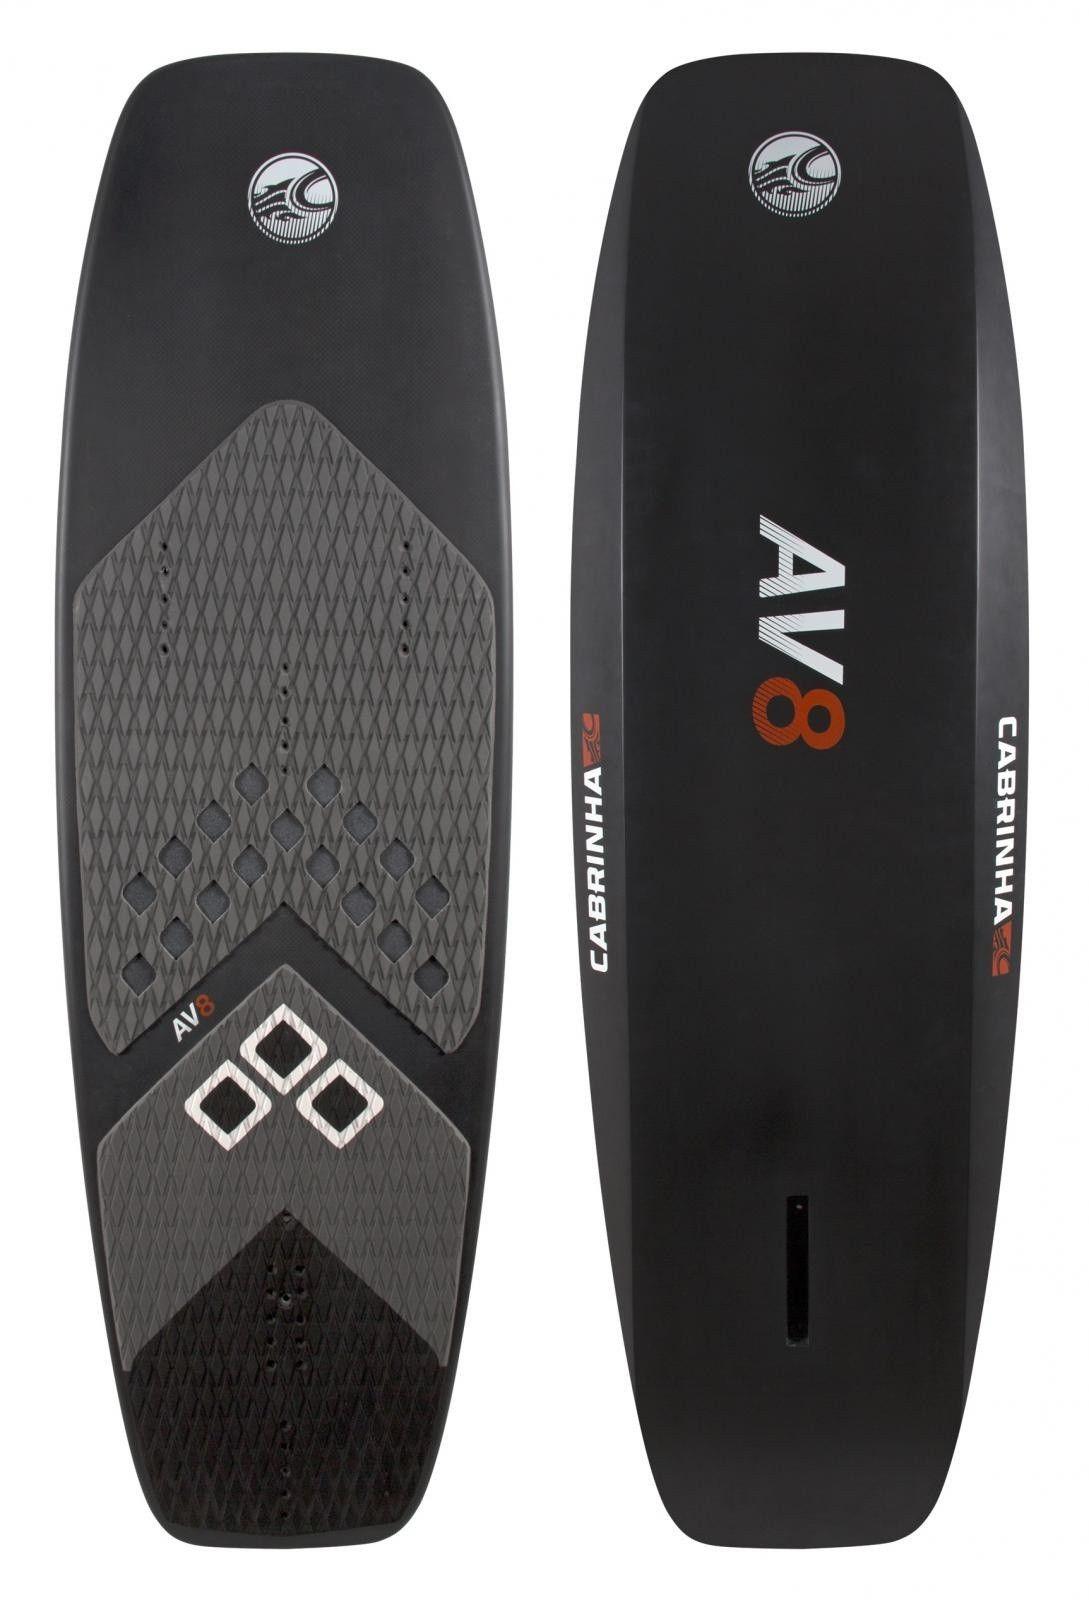 Cabrinha AV8 Foil Kite Board Only